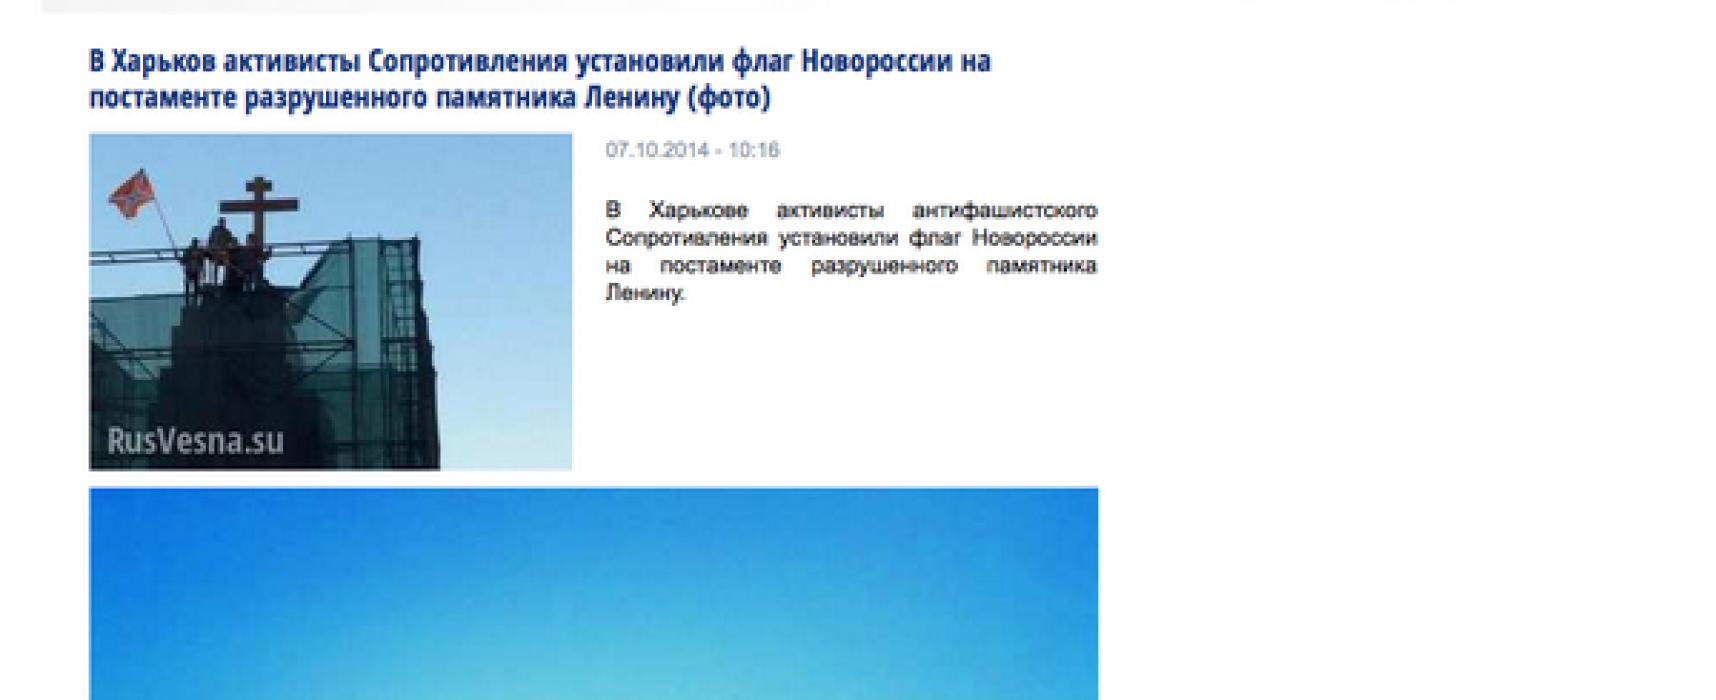 Fake Images of Novorussia flag on spot of Dismantled Monument to Lenin in Kharkiv